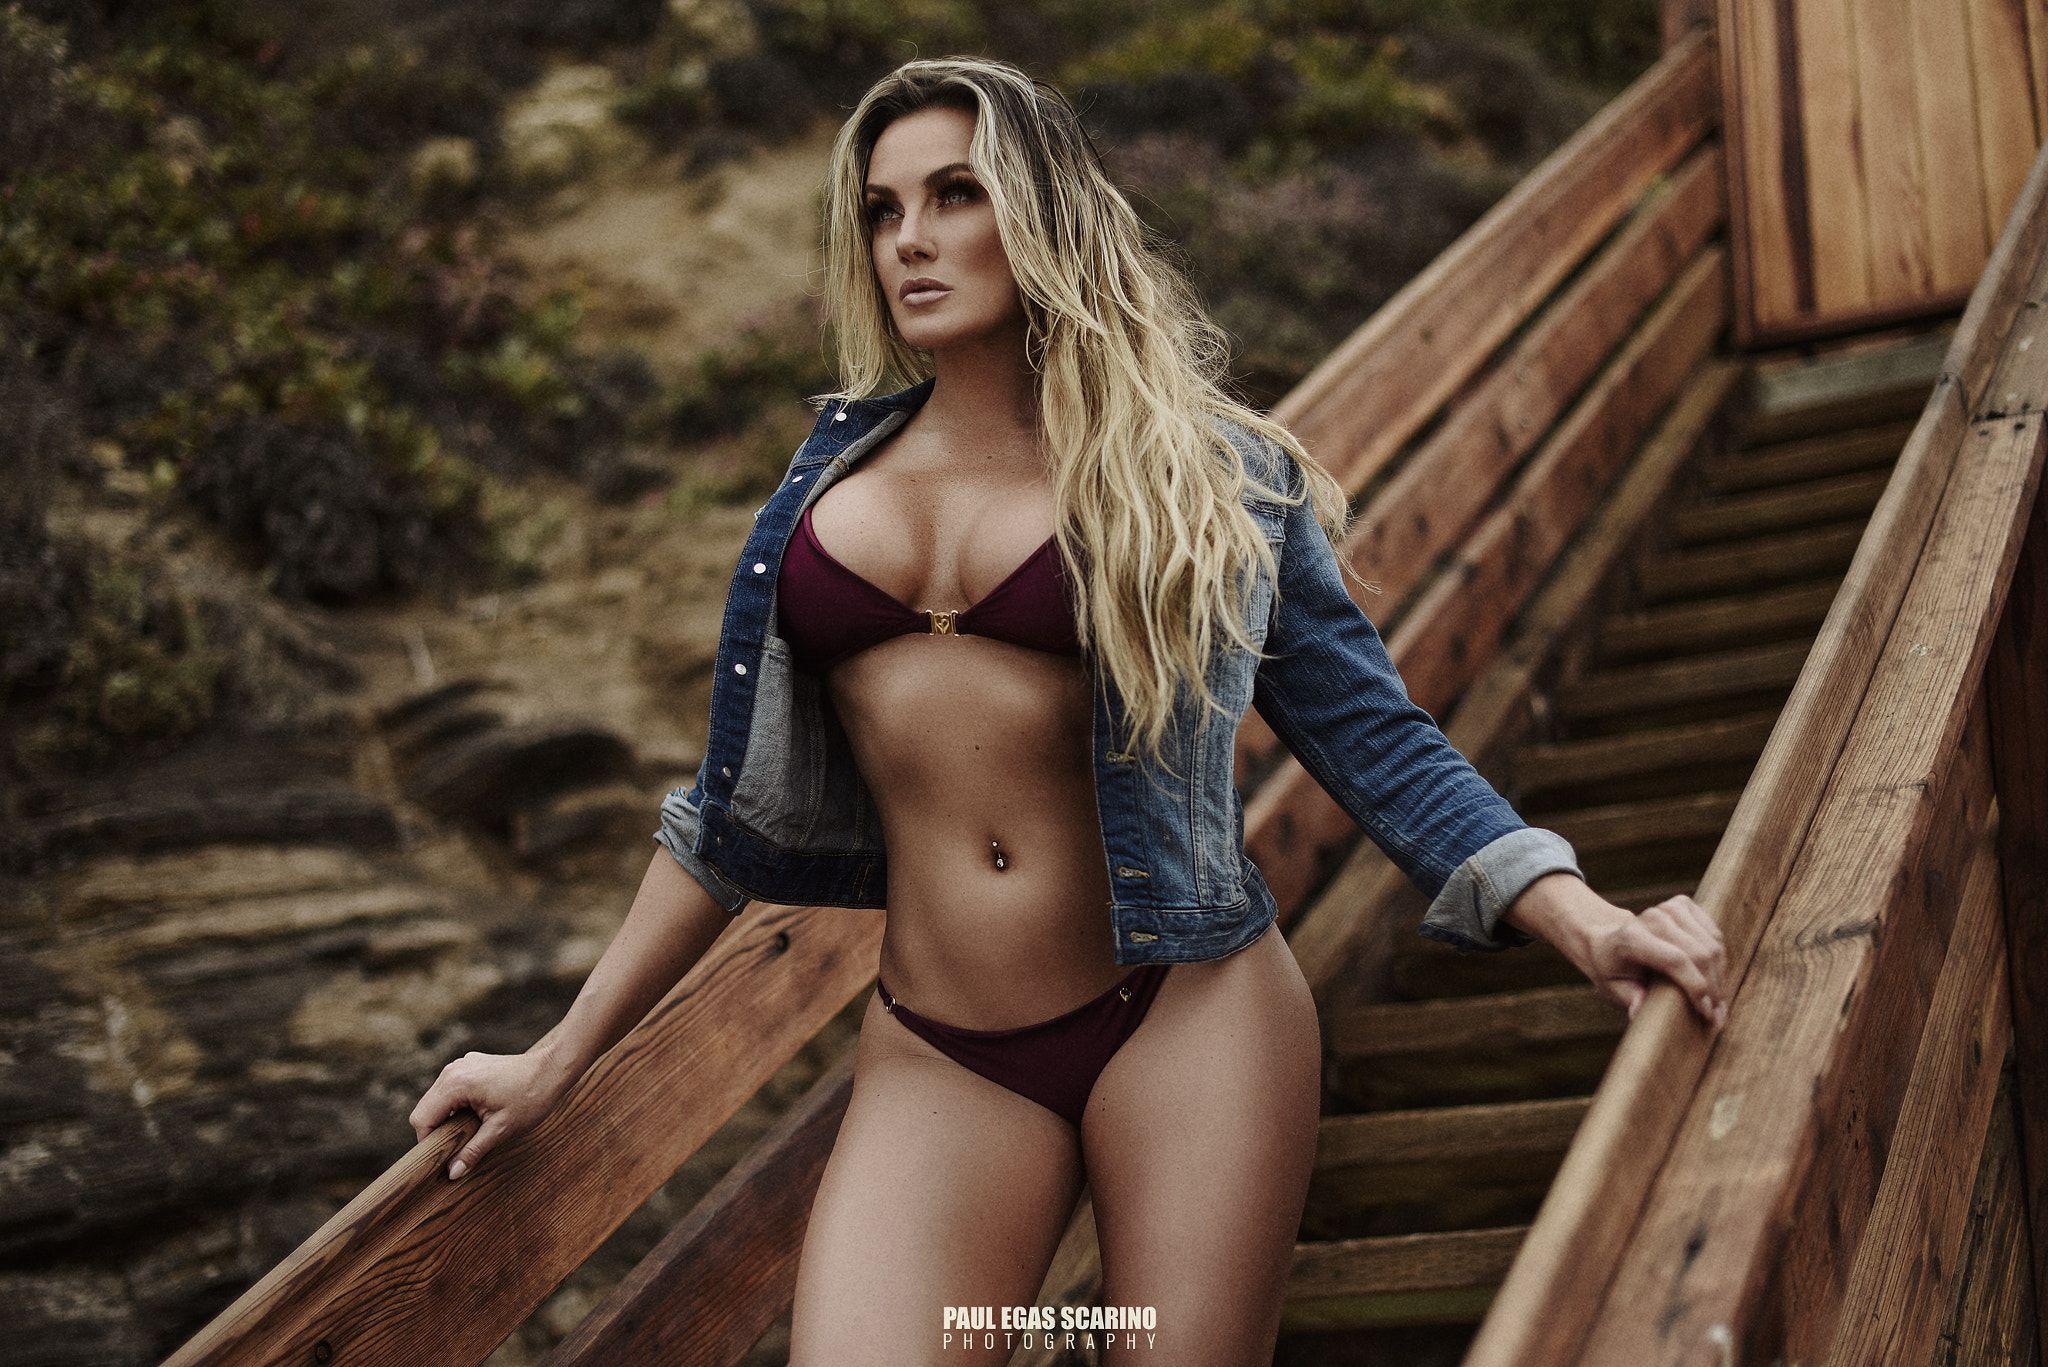 Leaked Amber Nichole Miller nudes (13 photo), Sexy, Sideboobs, Instagram, lingerie 2019